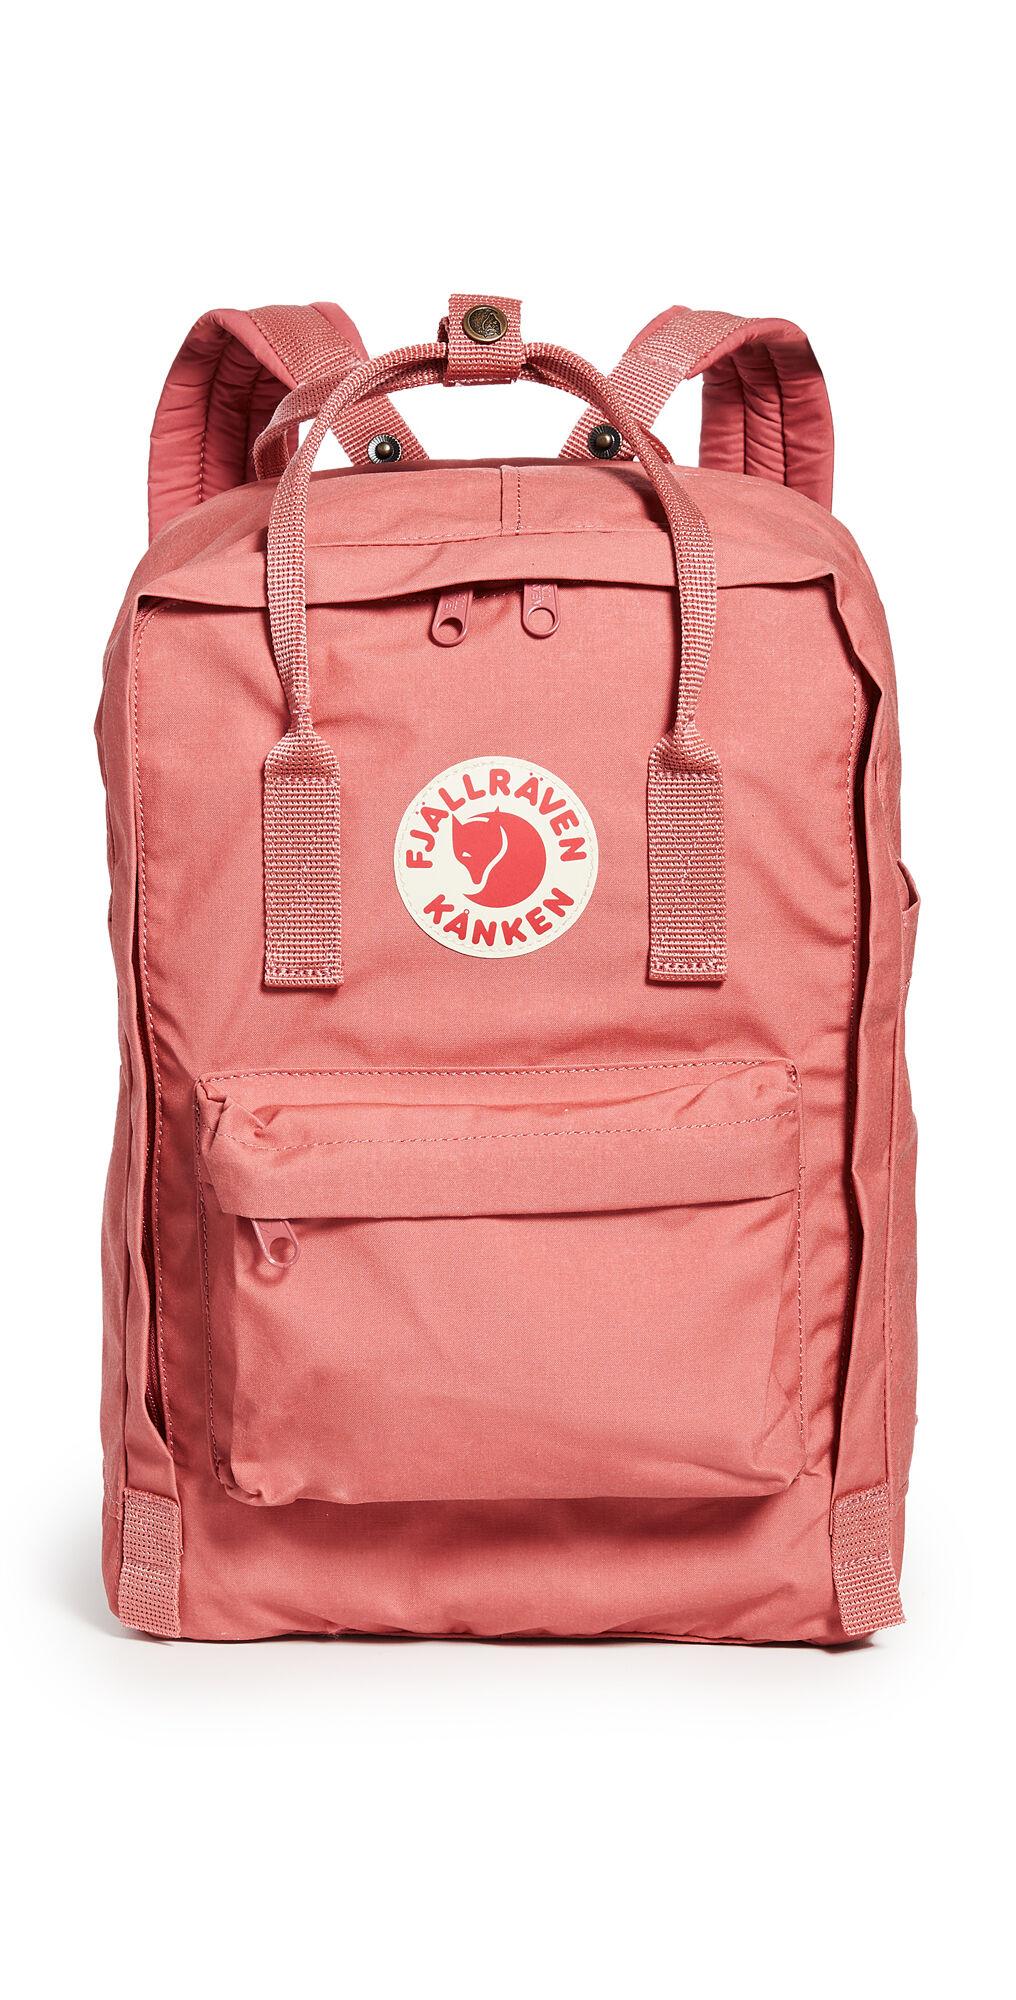 "Fjallraven Kanken 15 Laptop Backpack""  - Dahlia - Size: One Size"